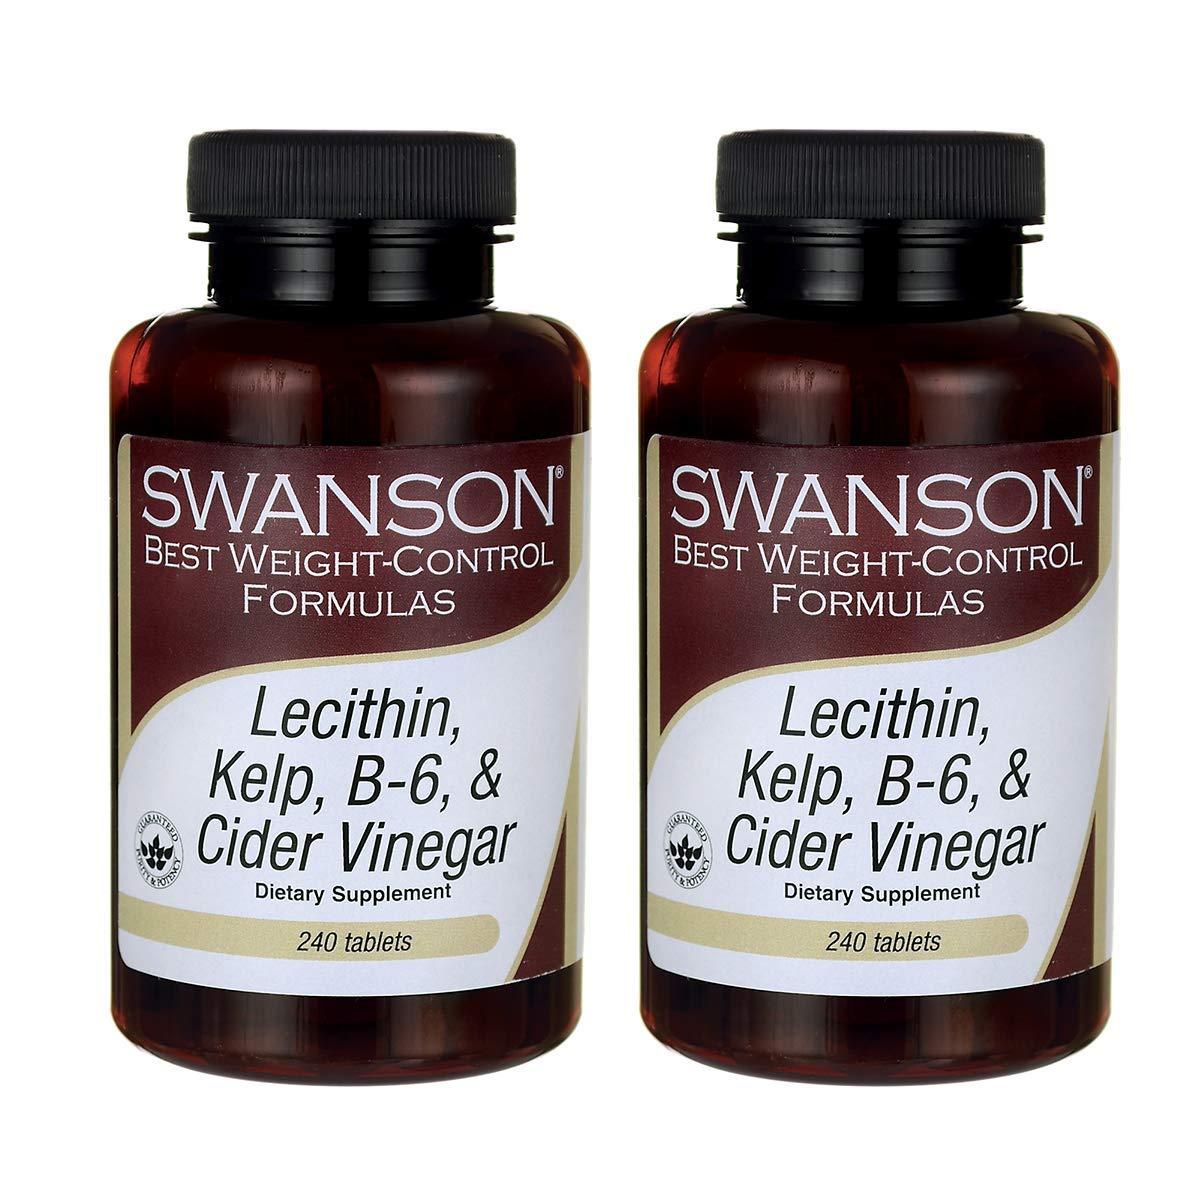 Swanson Lecithin Kelp B-6 & Cider Vinegar 240 Tabs (2 Pack) by Swanson